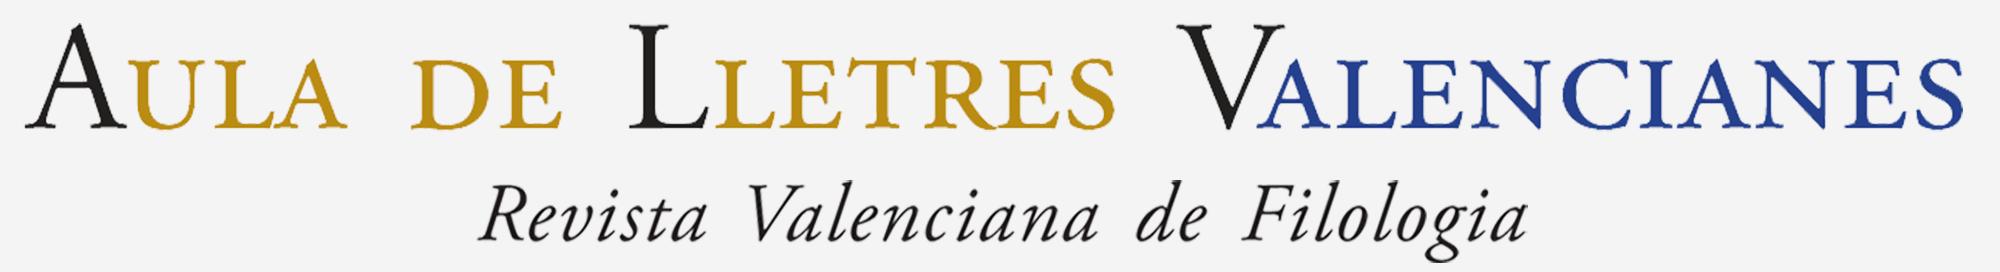 Aula de Lletres Valencianes - Revista Valenciana de Filologia